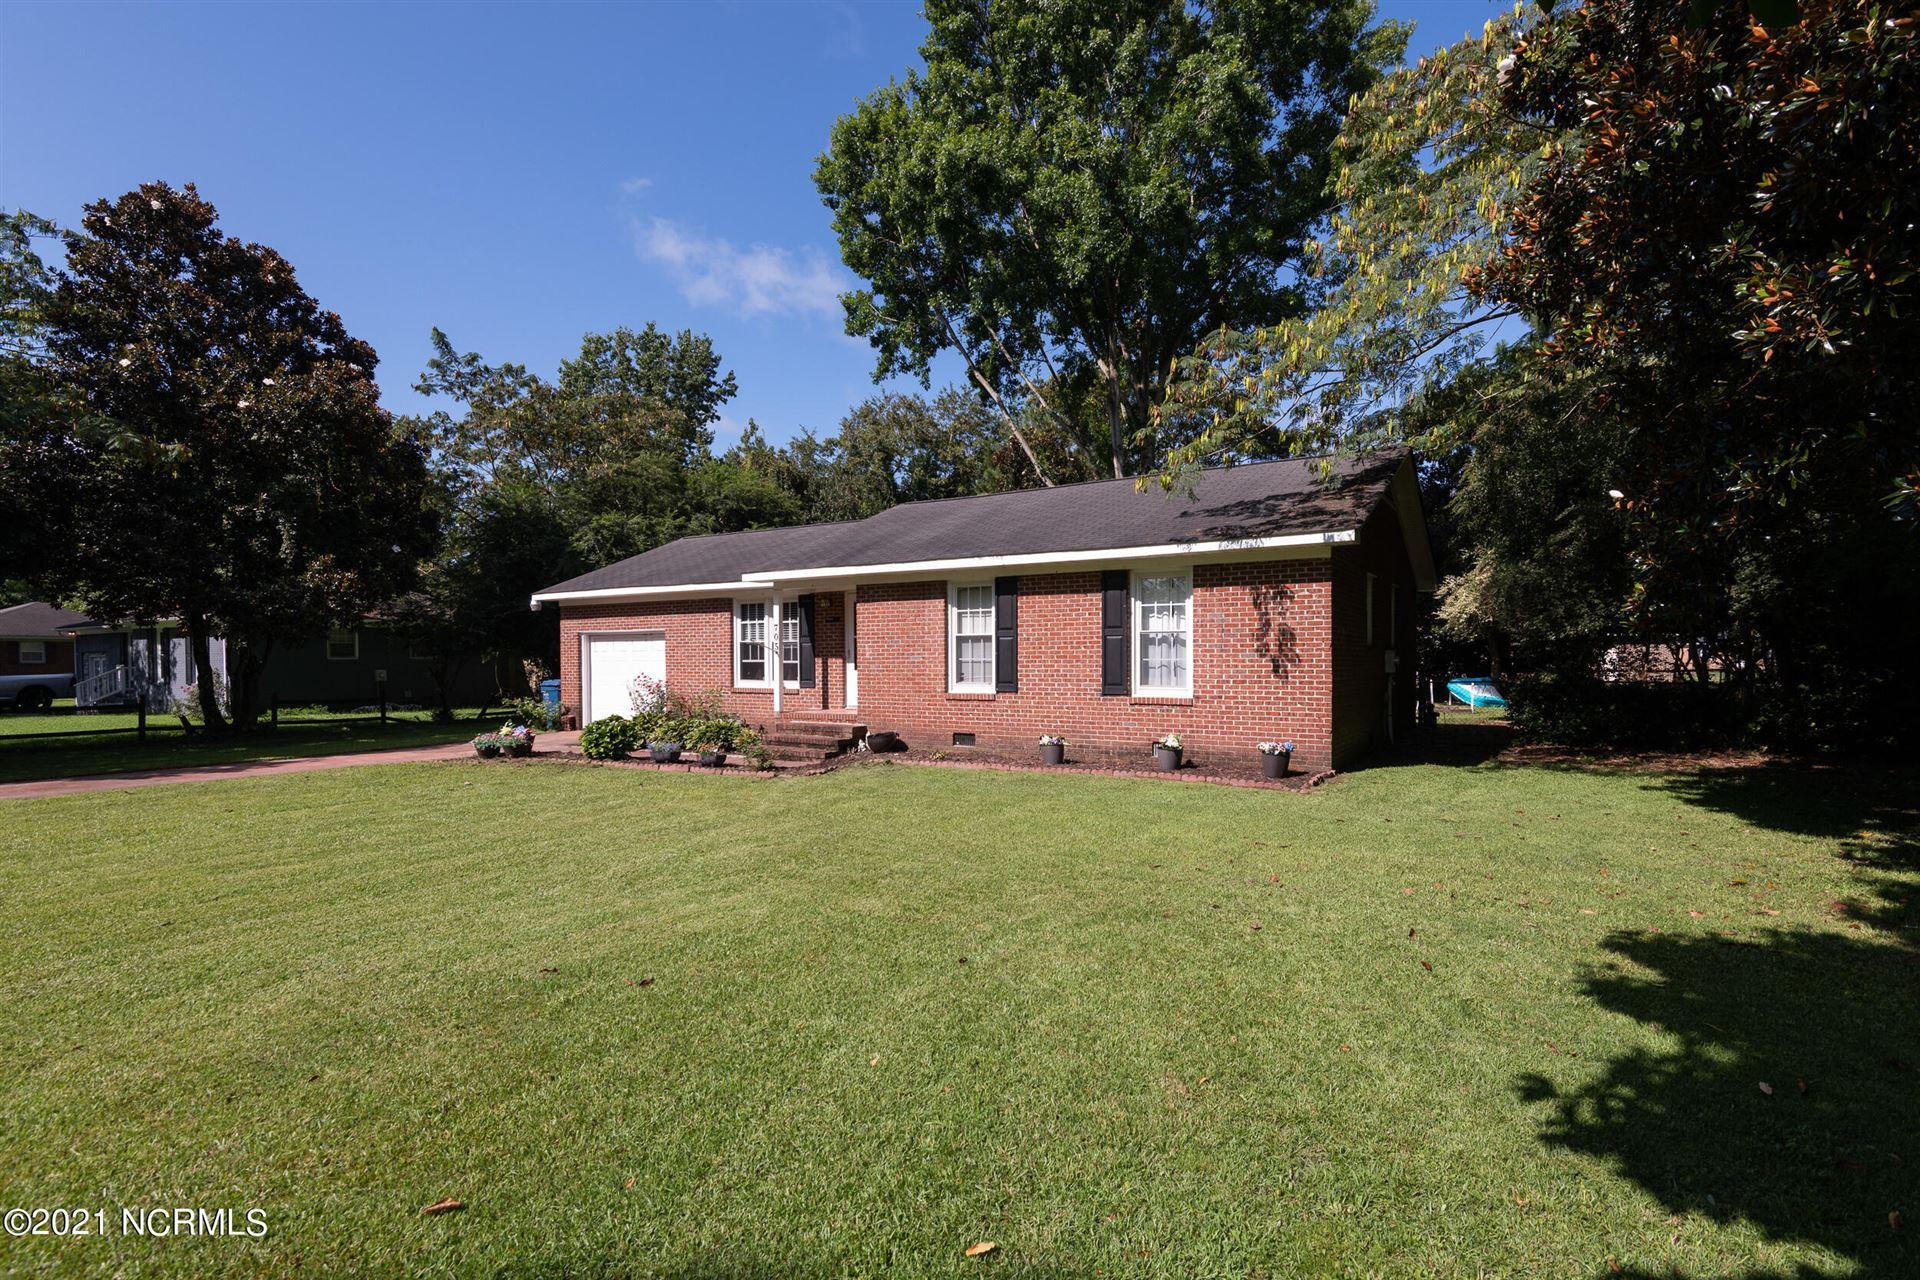 Photo of 705 Circle Drive, Greenville, NC 27858 (MLS # 100294548)